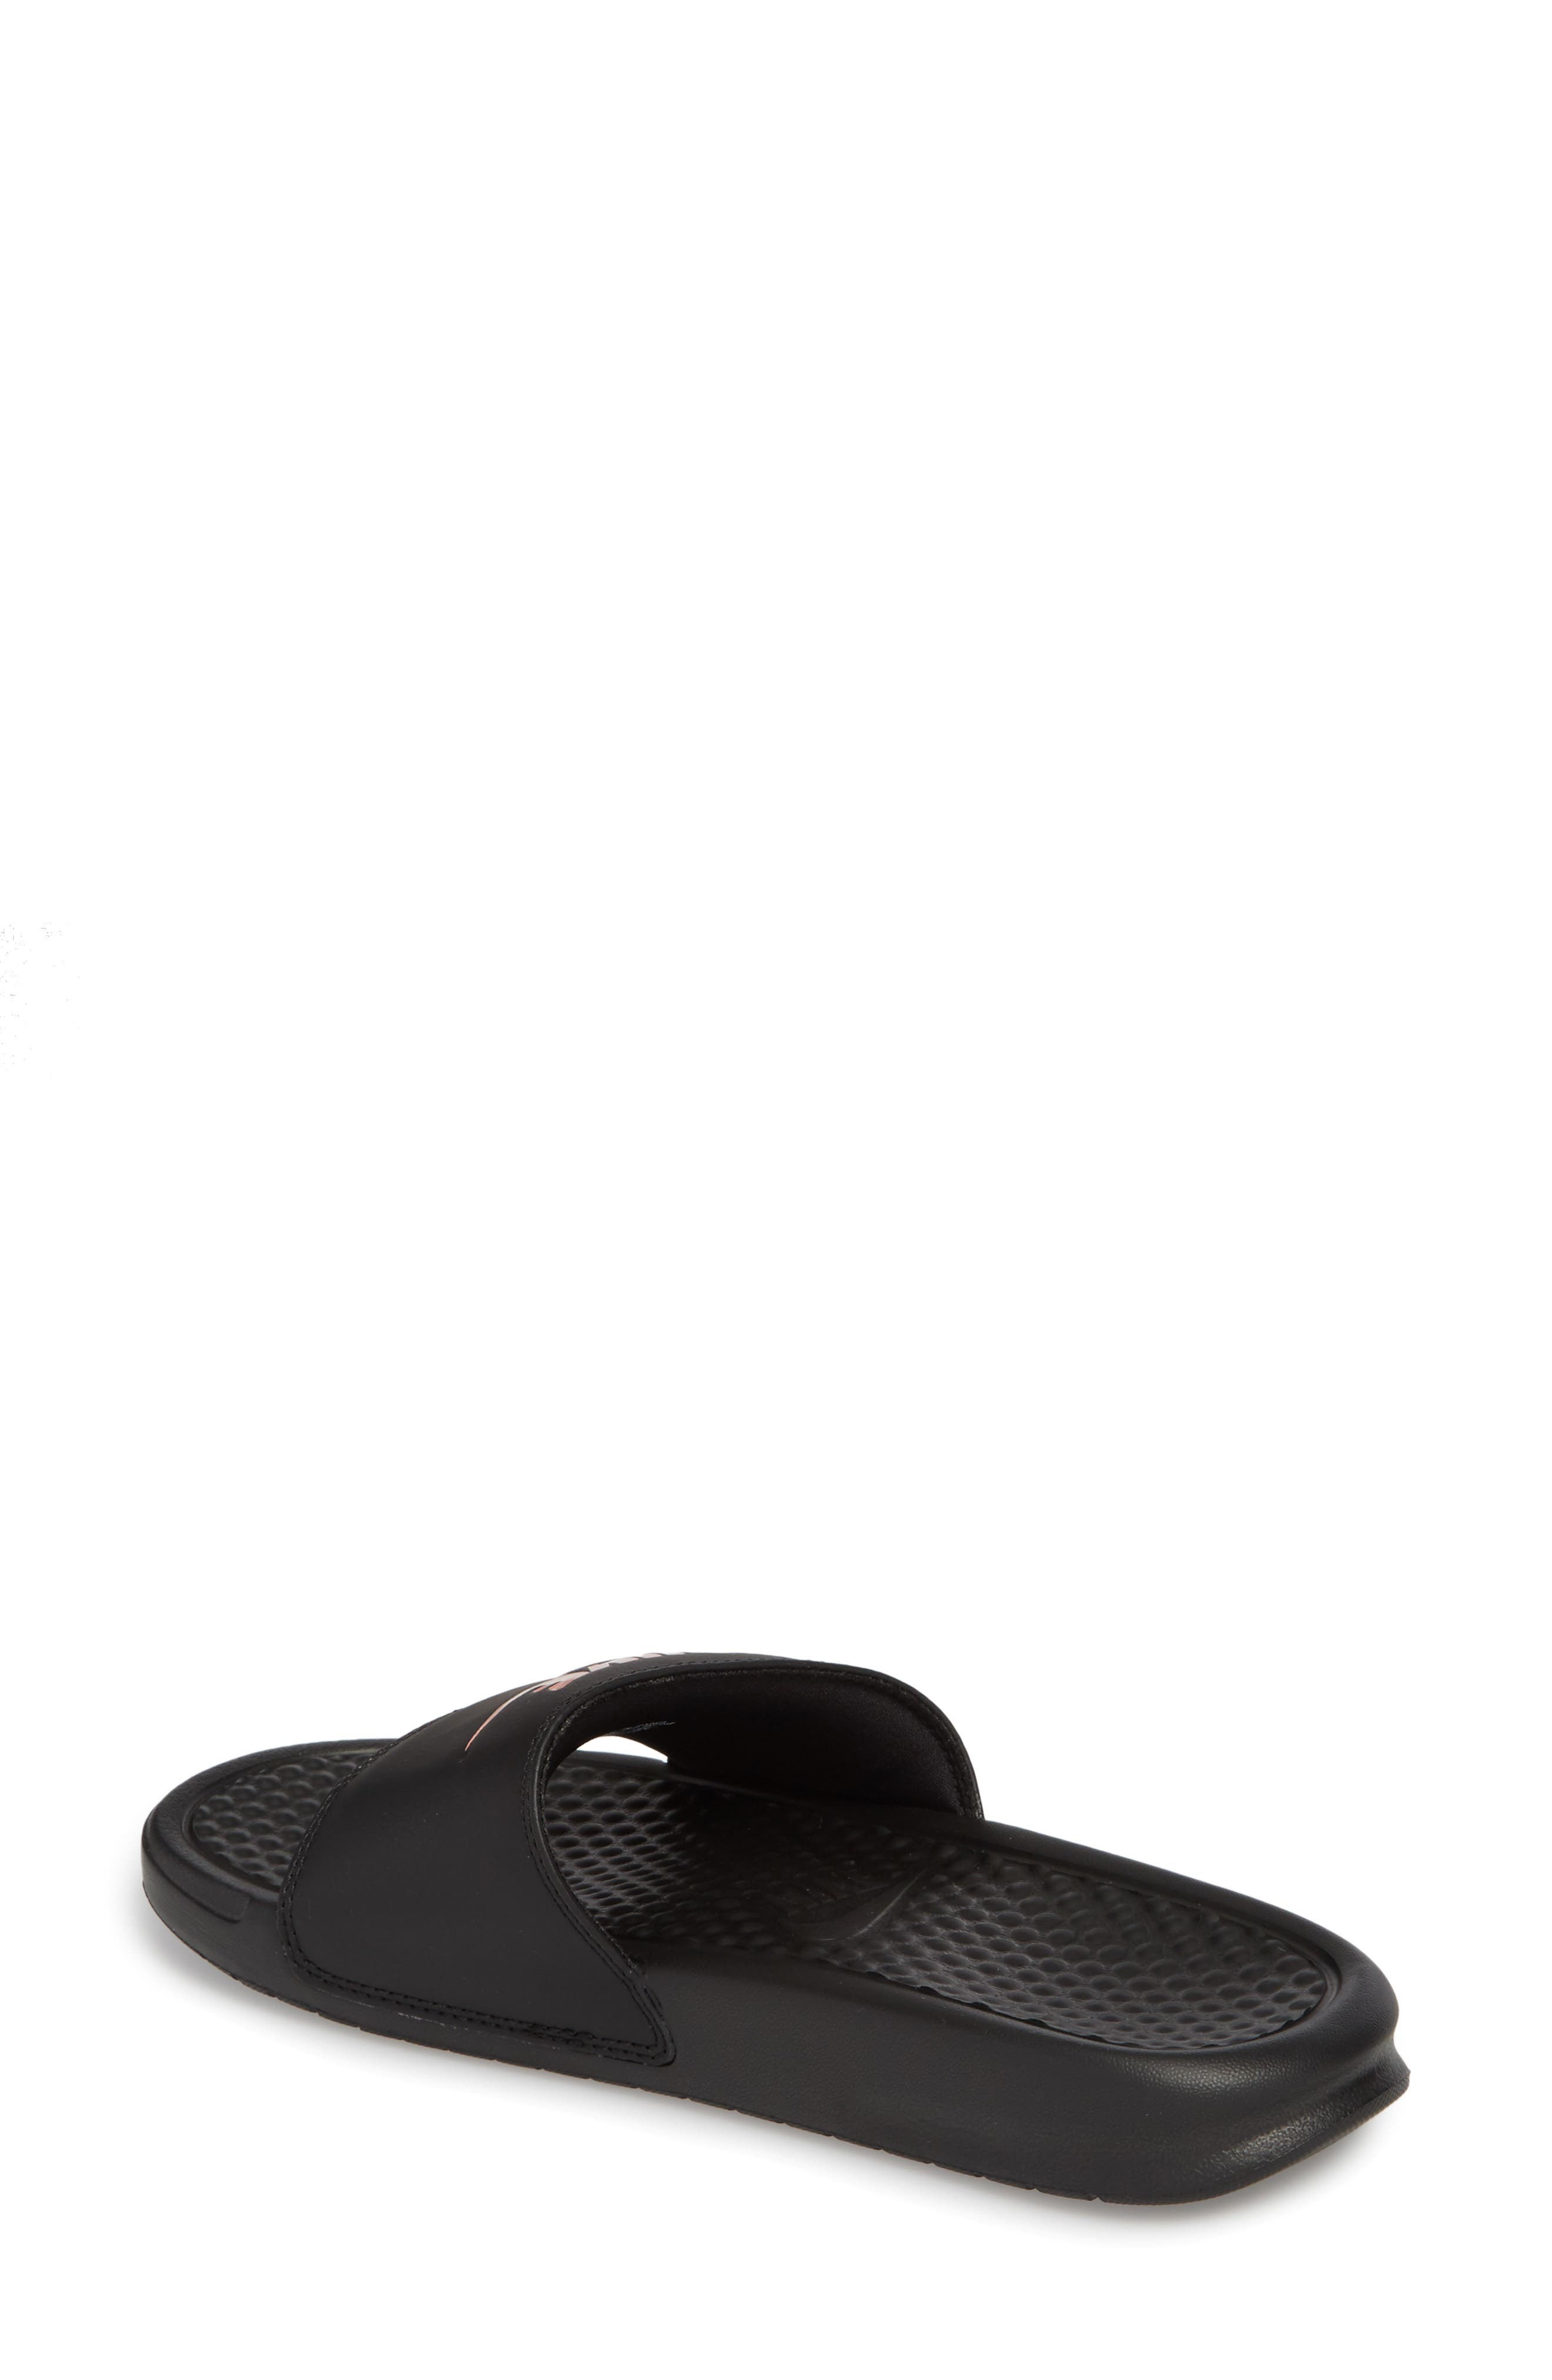 NIKE, Benassi JDI Slide Sandal, Alternate thumbnail 2, color, BLACK/ ROSE GOLD